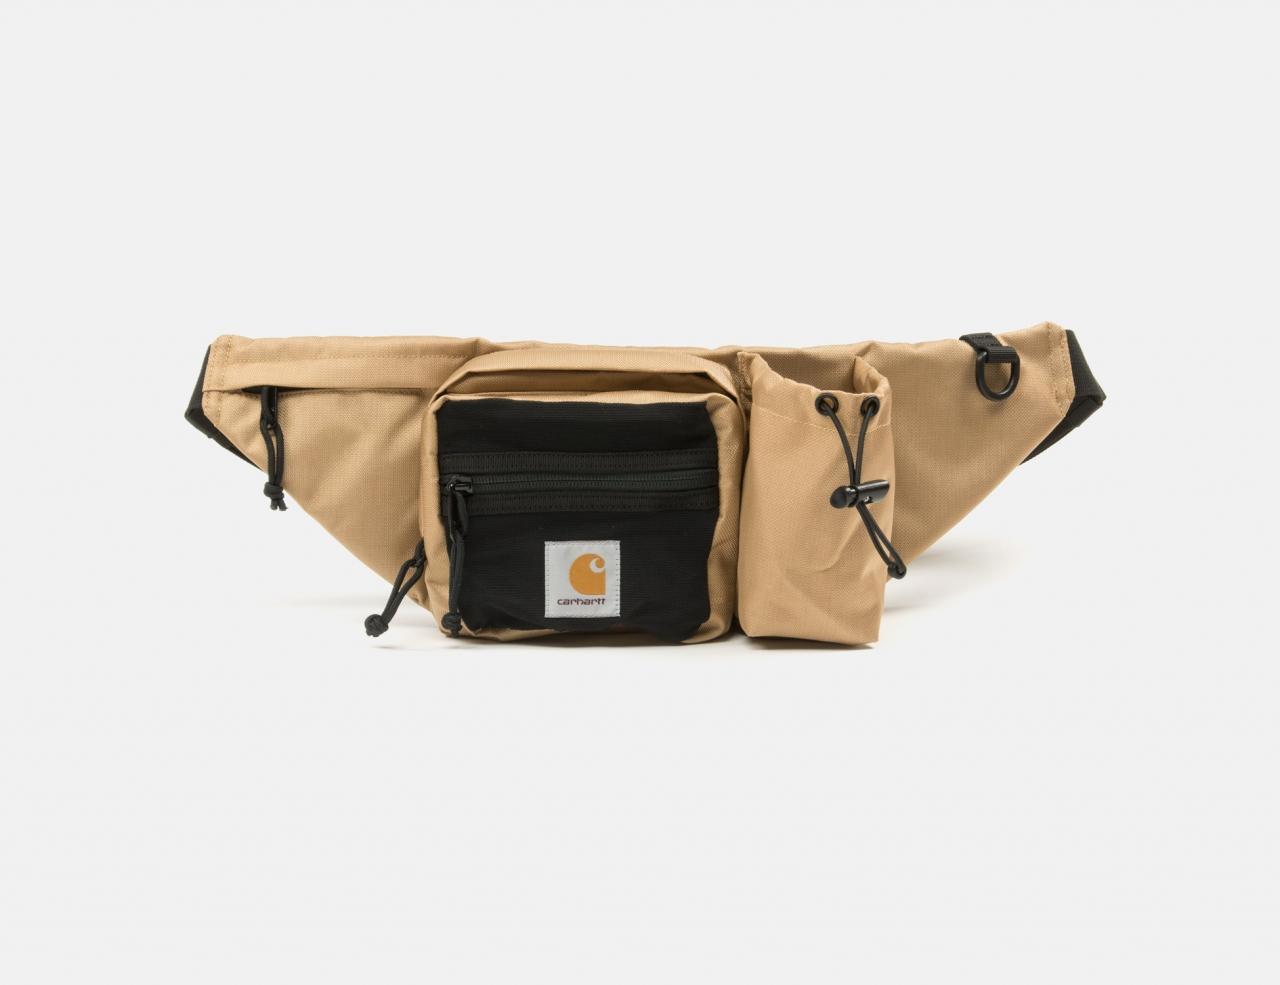 Carhartt WIP Delta Hip Bag - Dusty H Brown